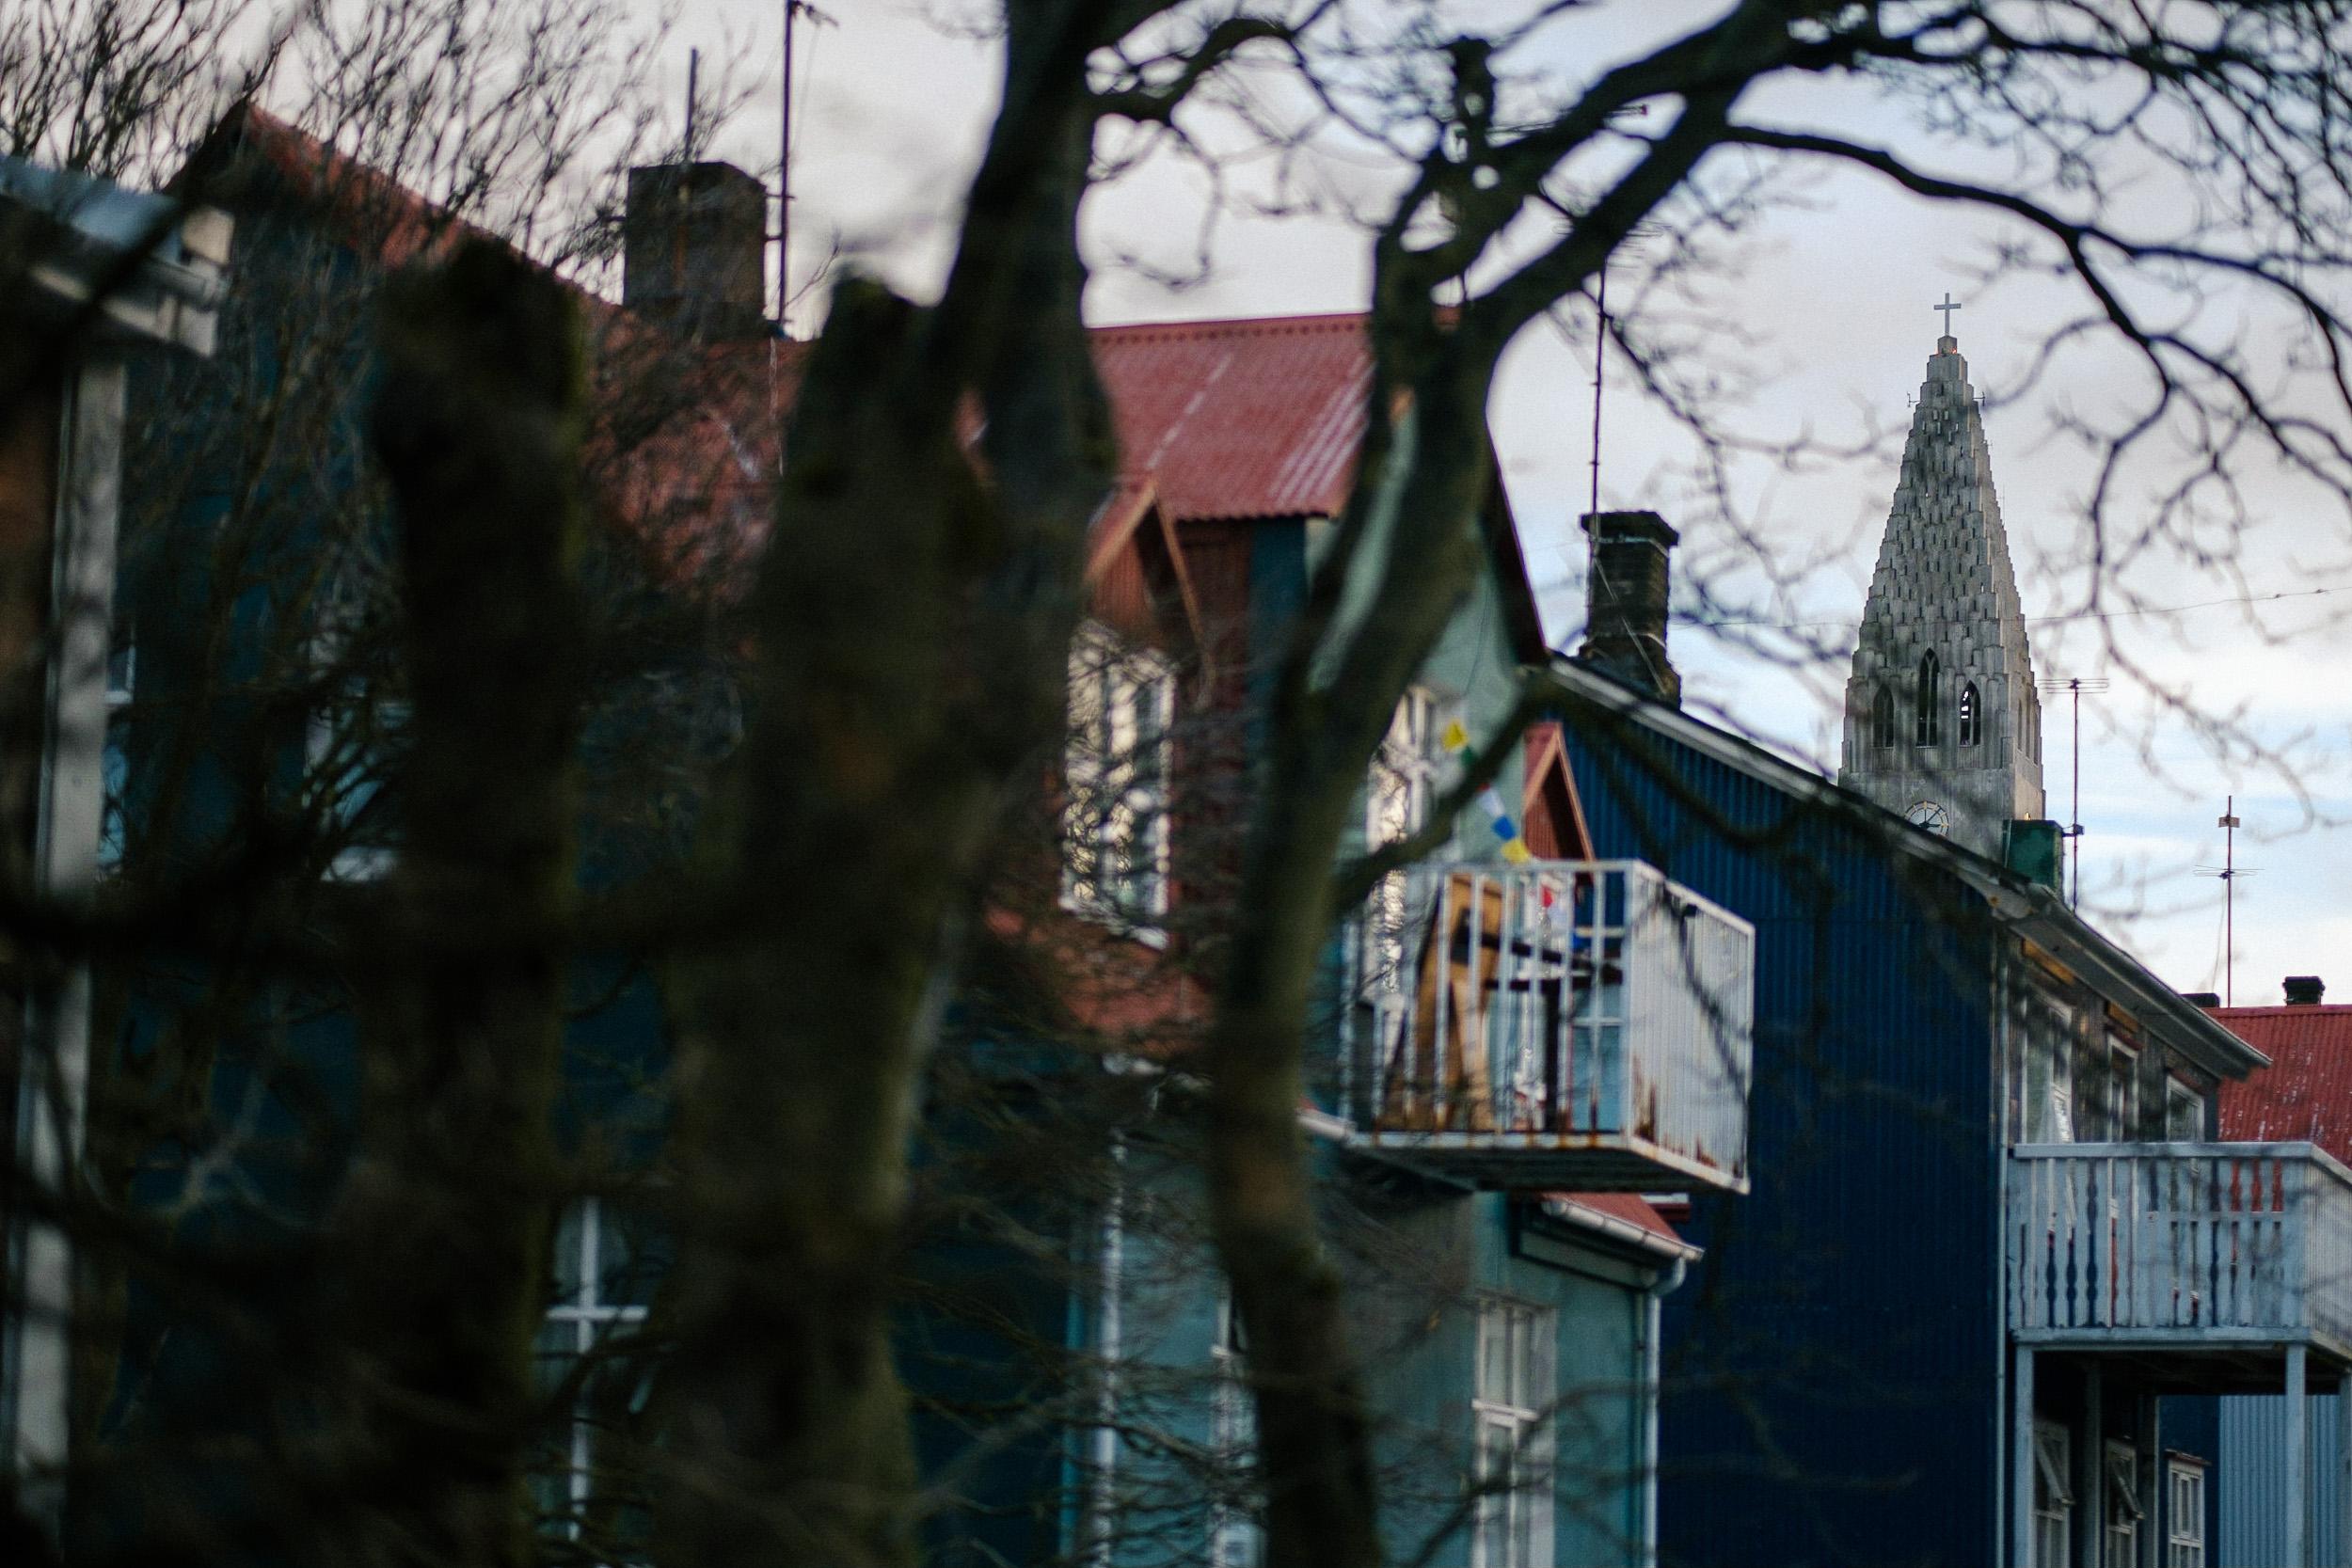 Collective_Wander_Iceland_Photographers_Trip_002.jpg